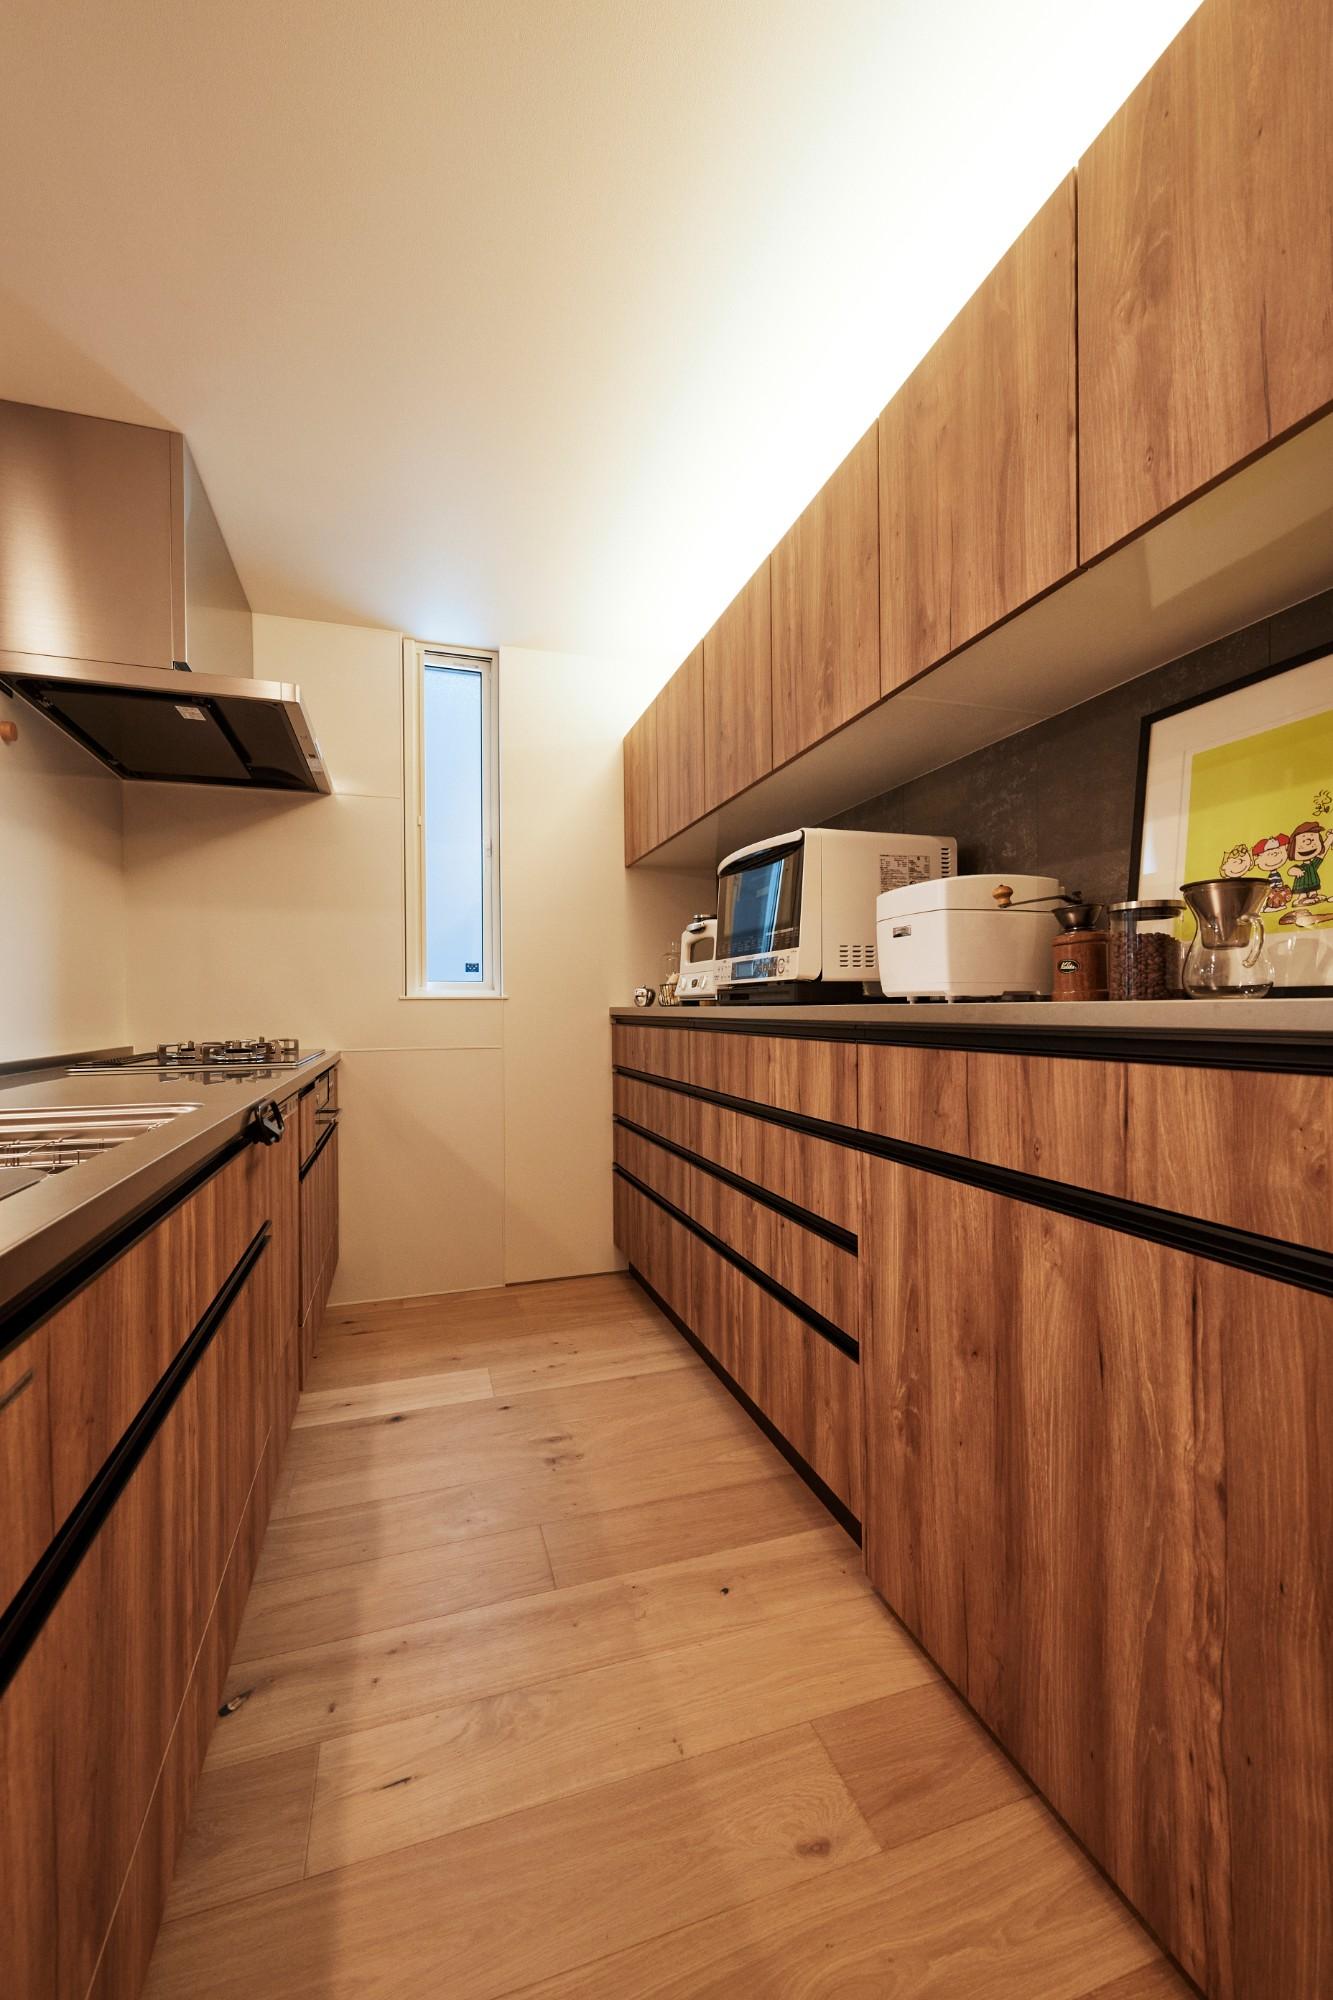 DETAIL HOME(ディテールホーム)「コンパクトにデザインする家」のシンプル・ナチュラルなキッチンの実例写真